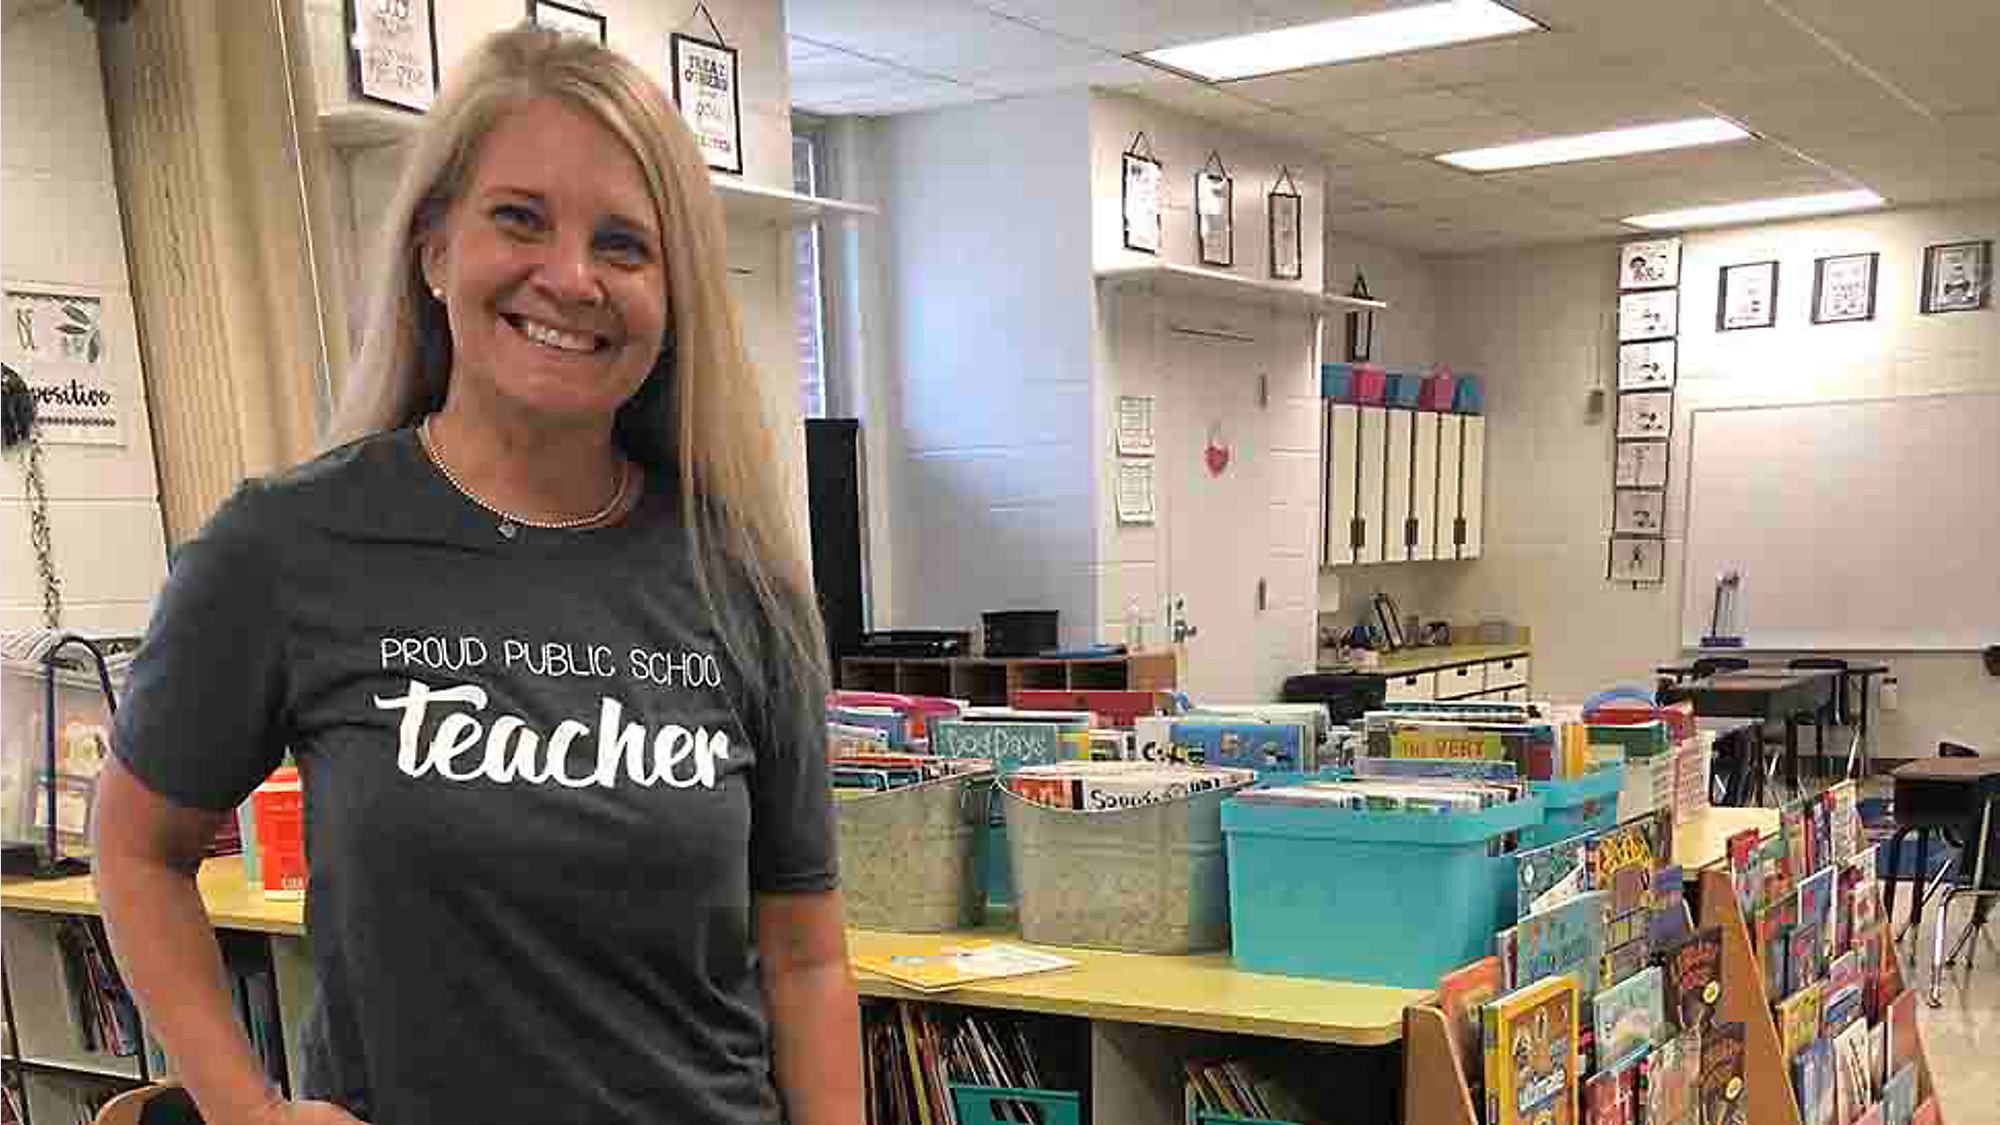 Teachers Use Amazon Wish Lists to Get School Supplies